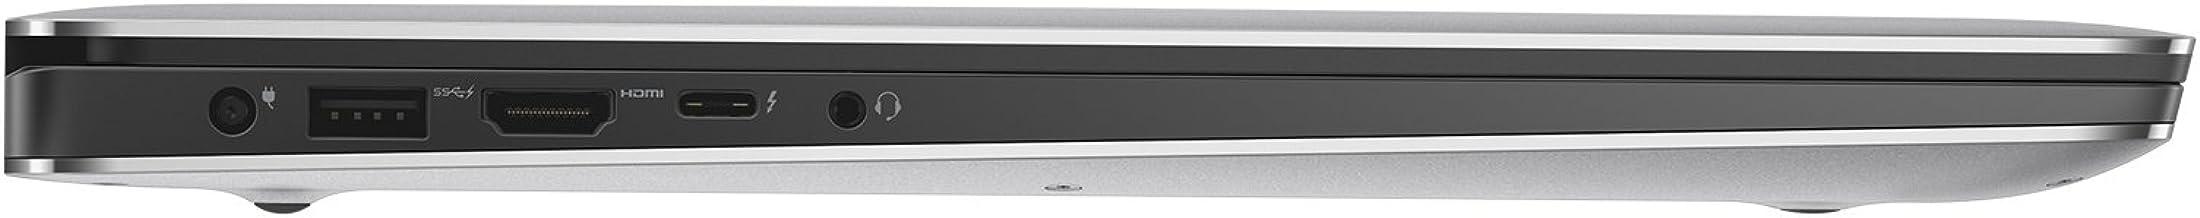 "Dell XPS 15 9550 Laptop 15.6"" 4K UHD (3840 x 2160) Touch, Intel Core i5-6300HQ 2.3GHz 8GB RAM, 1TB HDD + 32GB SSD, NVIDIA ..."